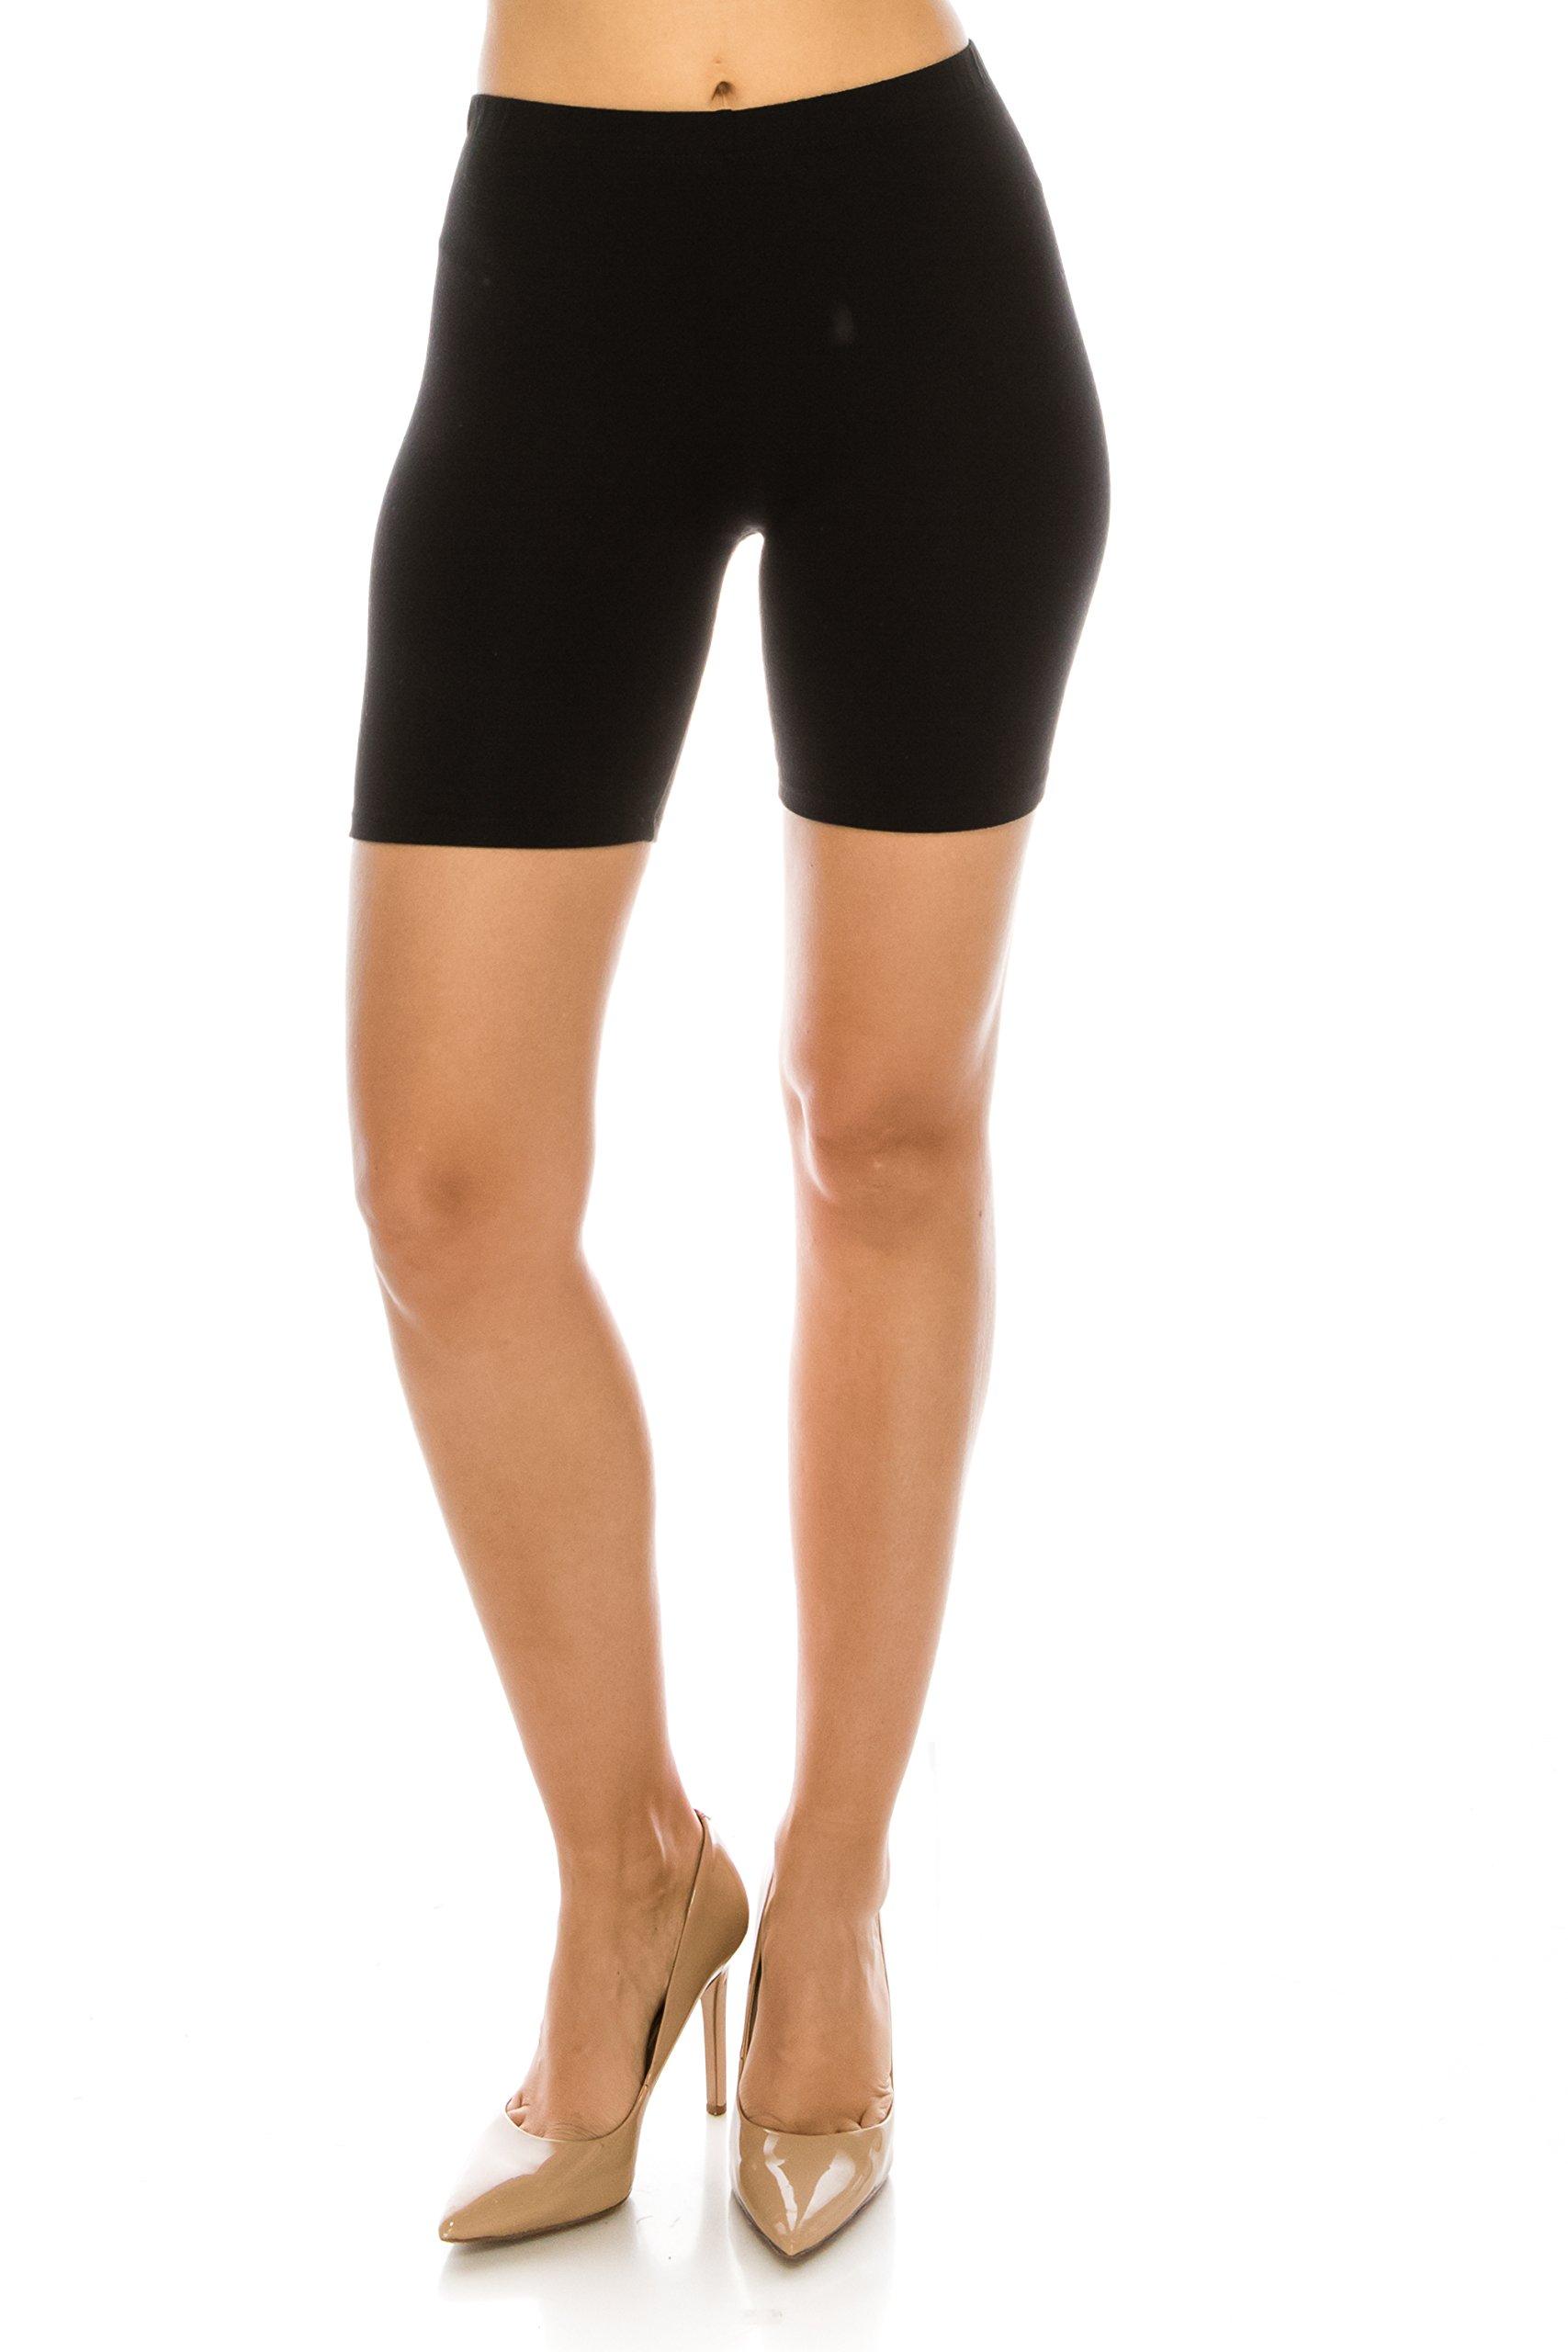 C&C Style Women's Stretch Jersey Bike Yoga Running Workout Bermuda Shorts Tights Pants Under Short Leggings S to 3XL Plus (1XL, Black)